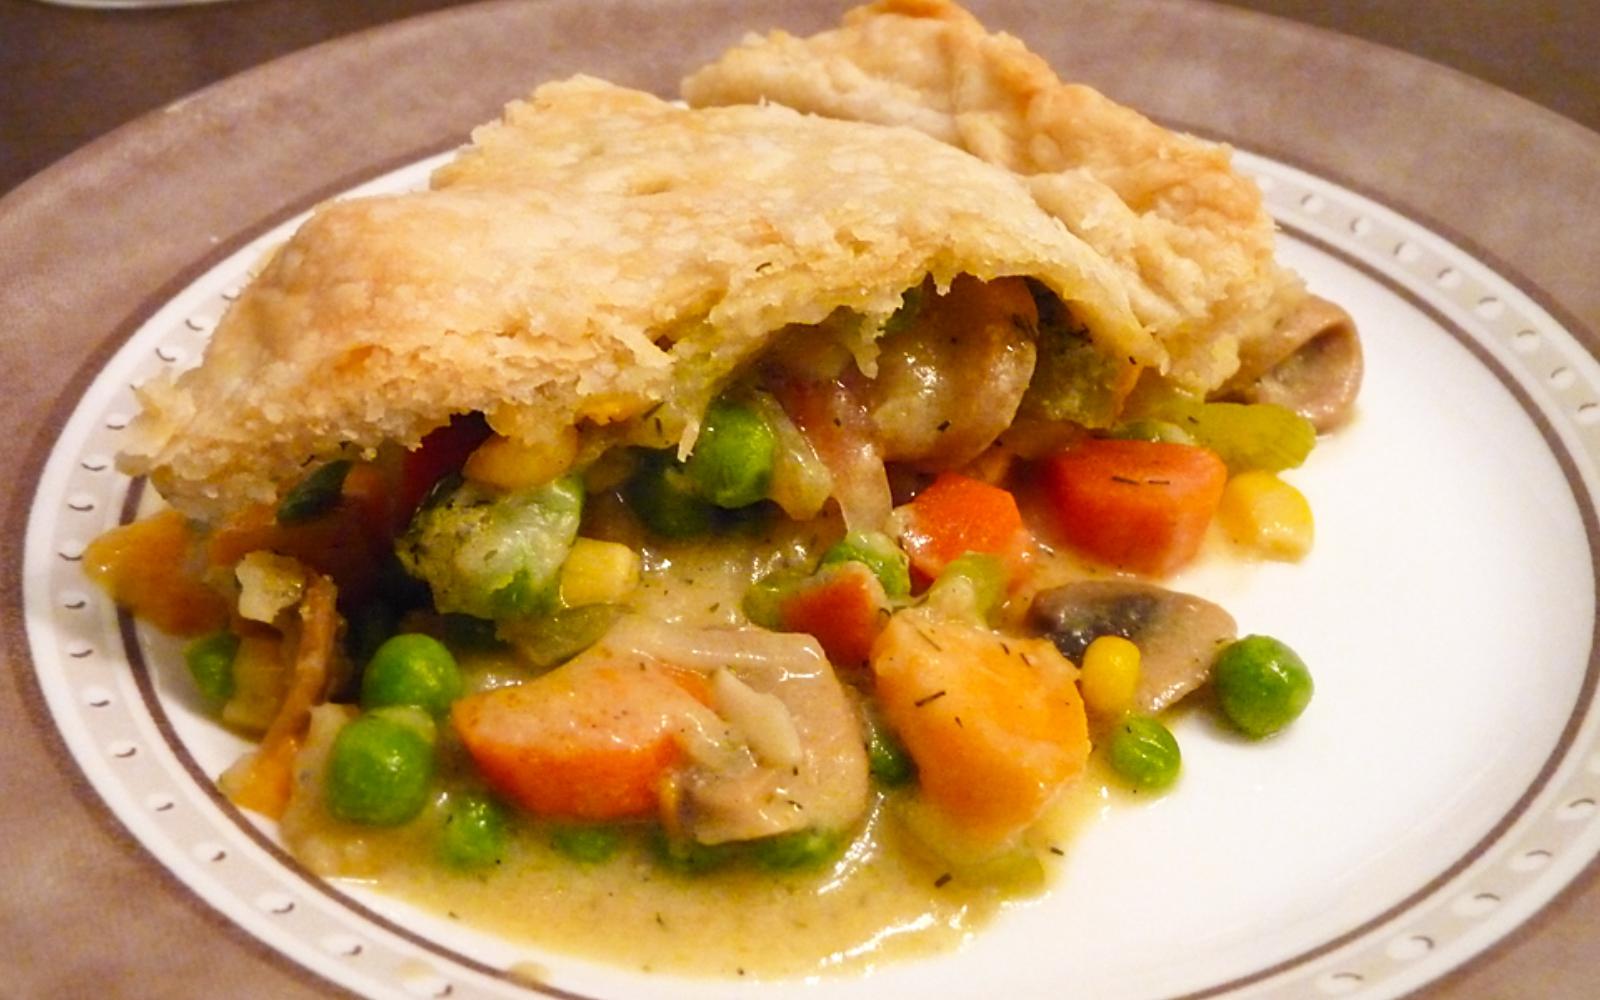 Vegan Vegetable Pot Pie With Dill Mustard Sauce